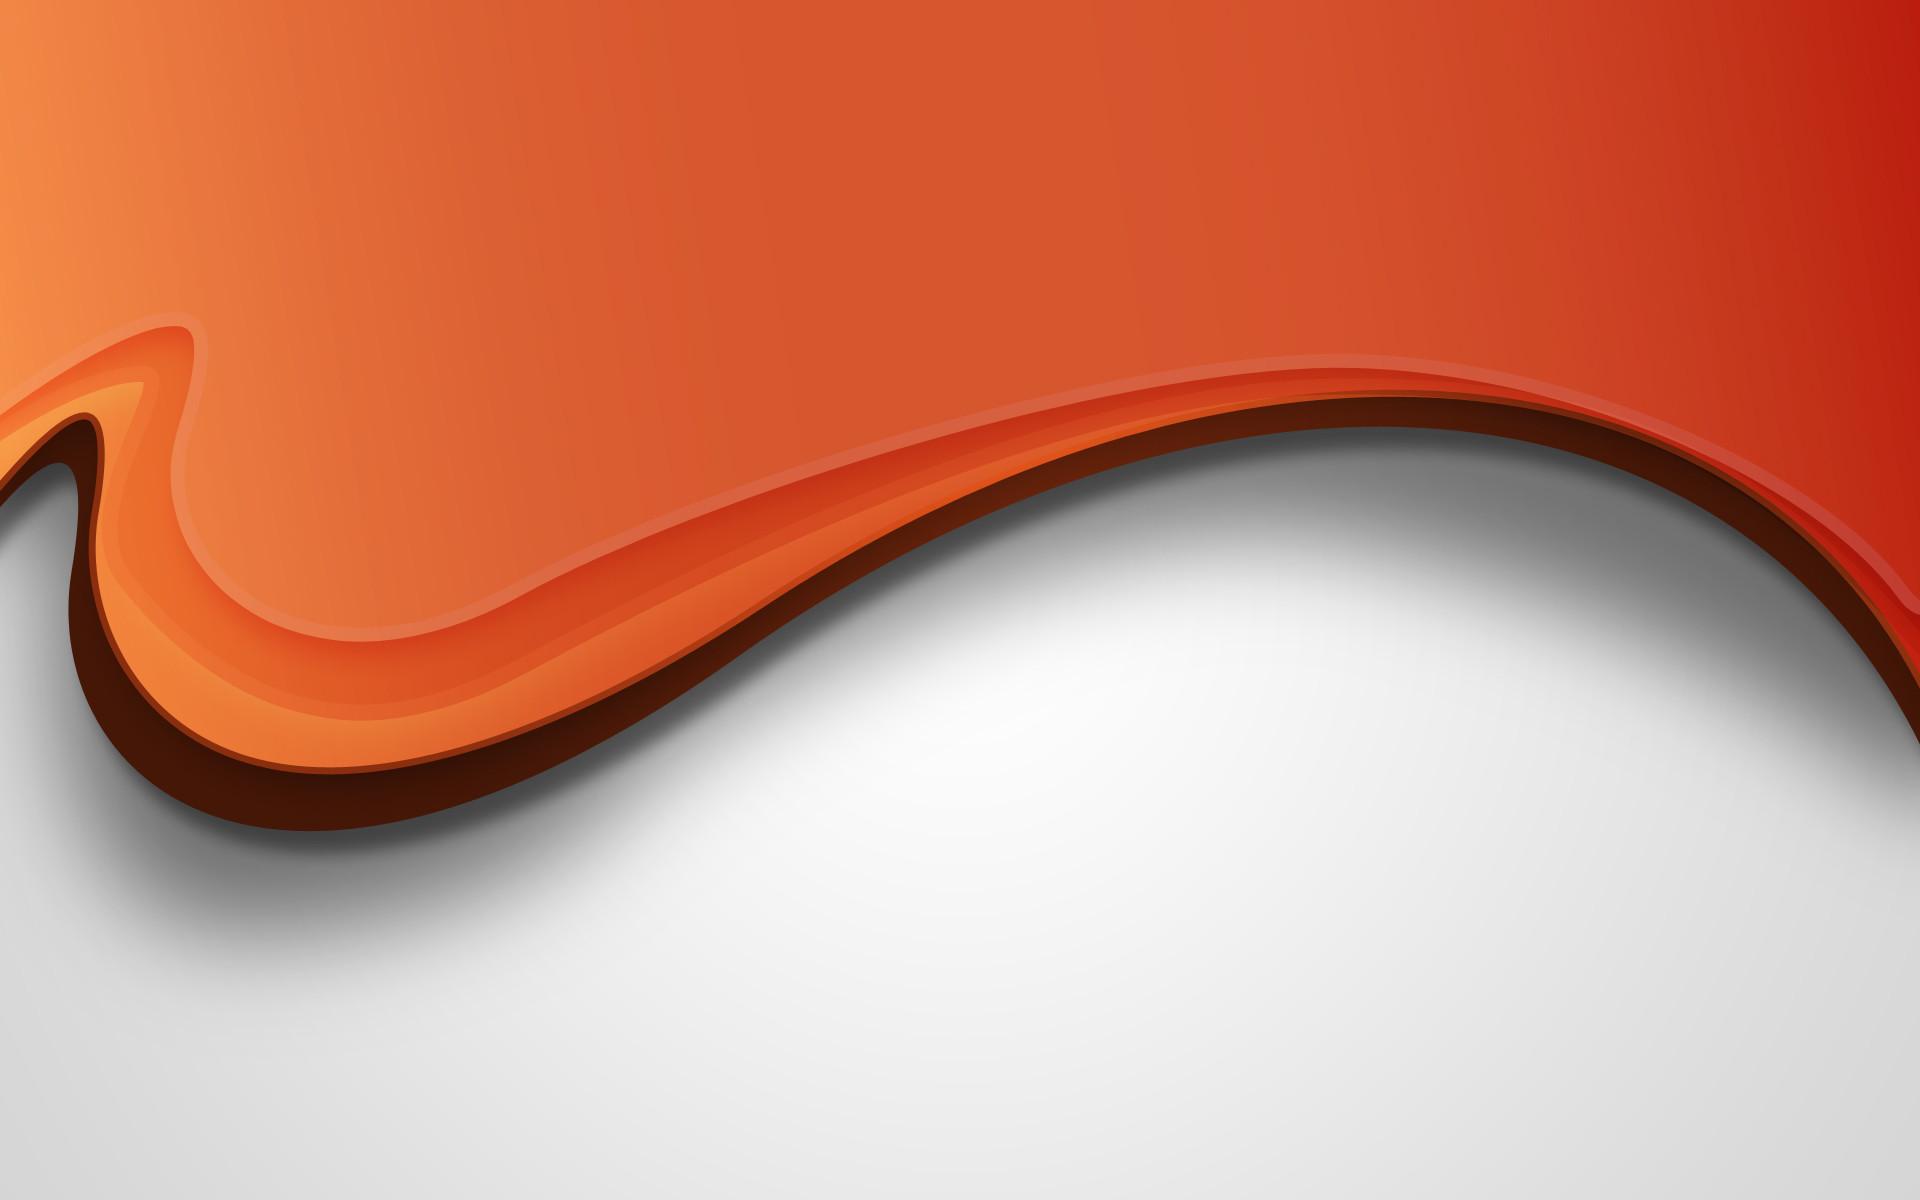 Orange Wallpaper 26